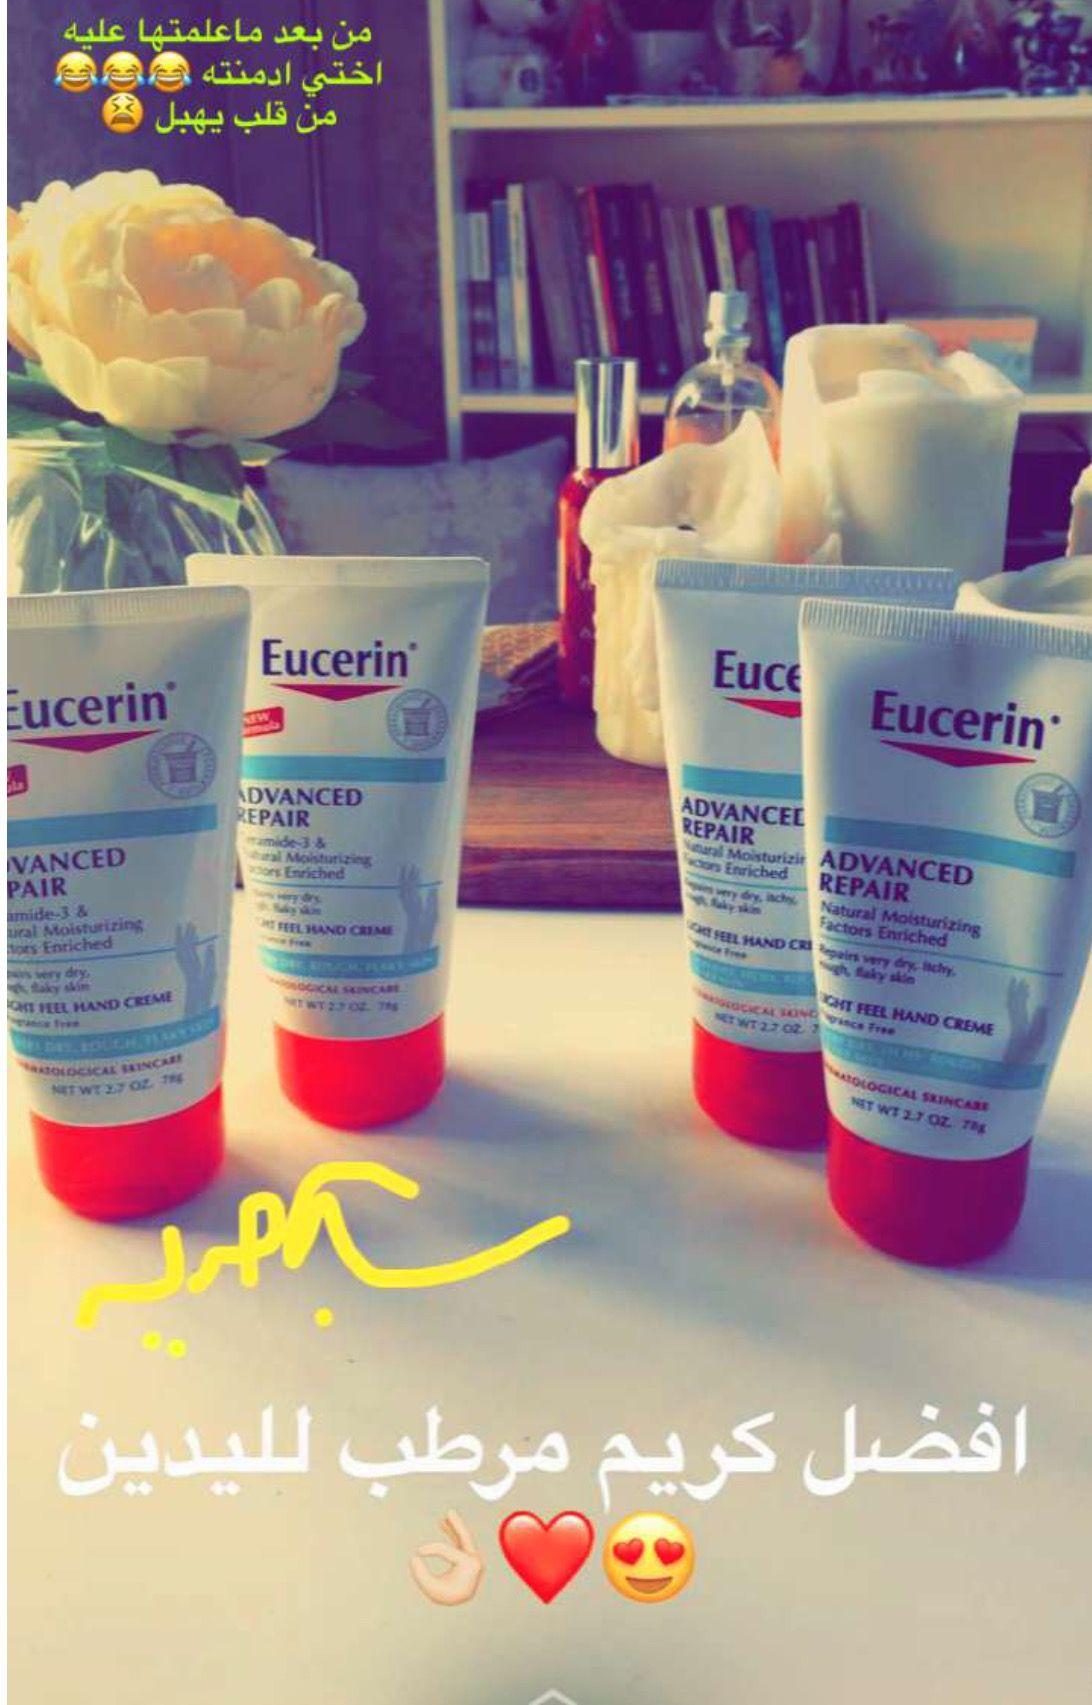 كريم مرطب لليدين Eucerin Creme Shampoo Bottle